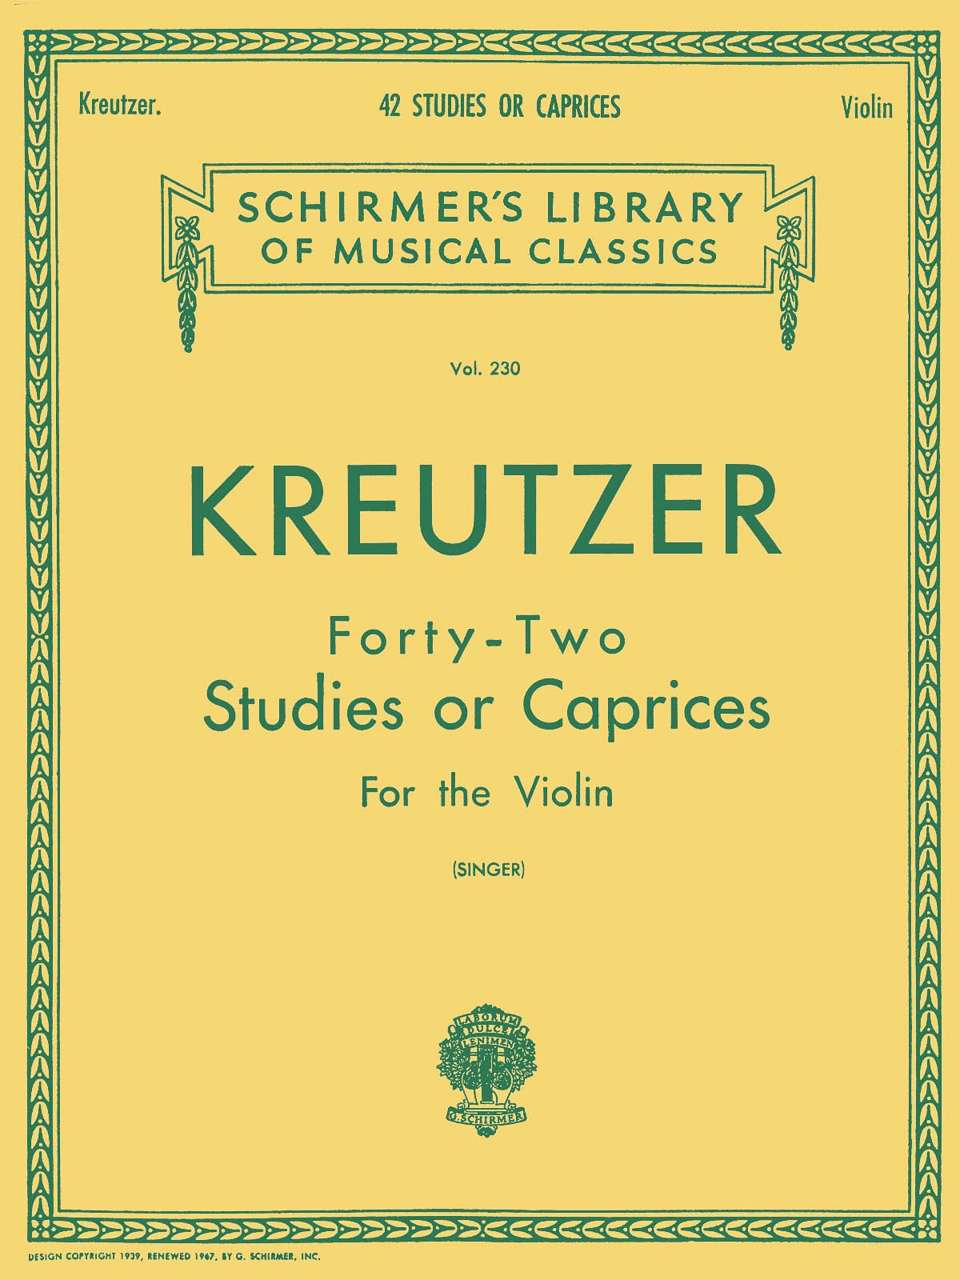 Best Violin Books - 42 Studies or Caprices by Rodolphe Kreutzer